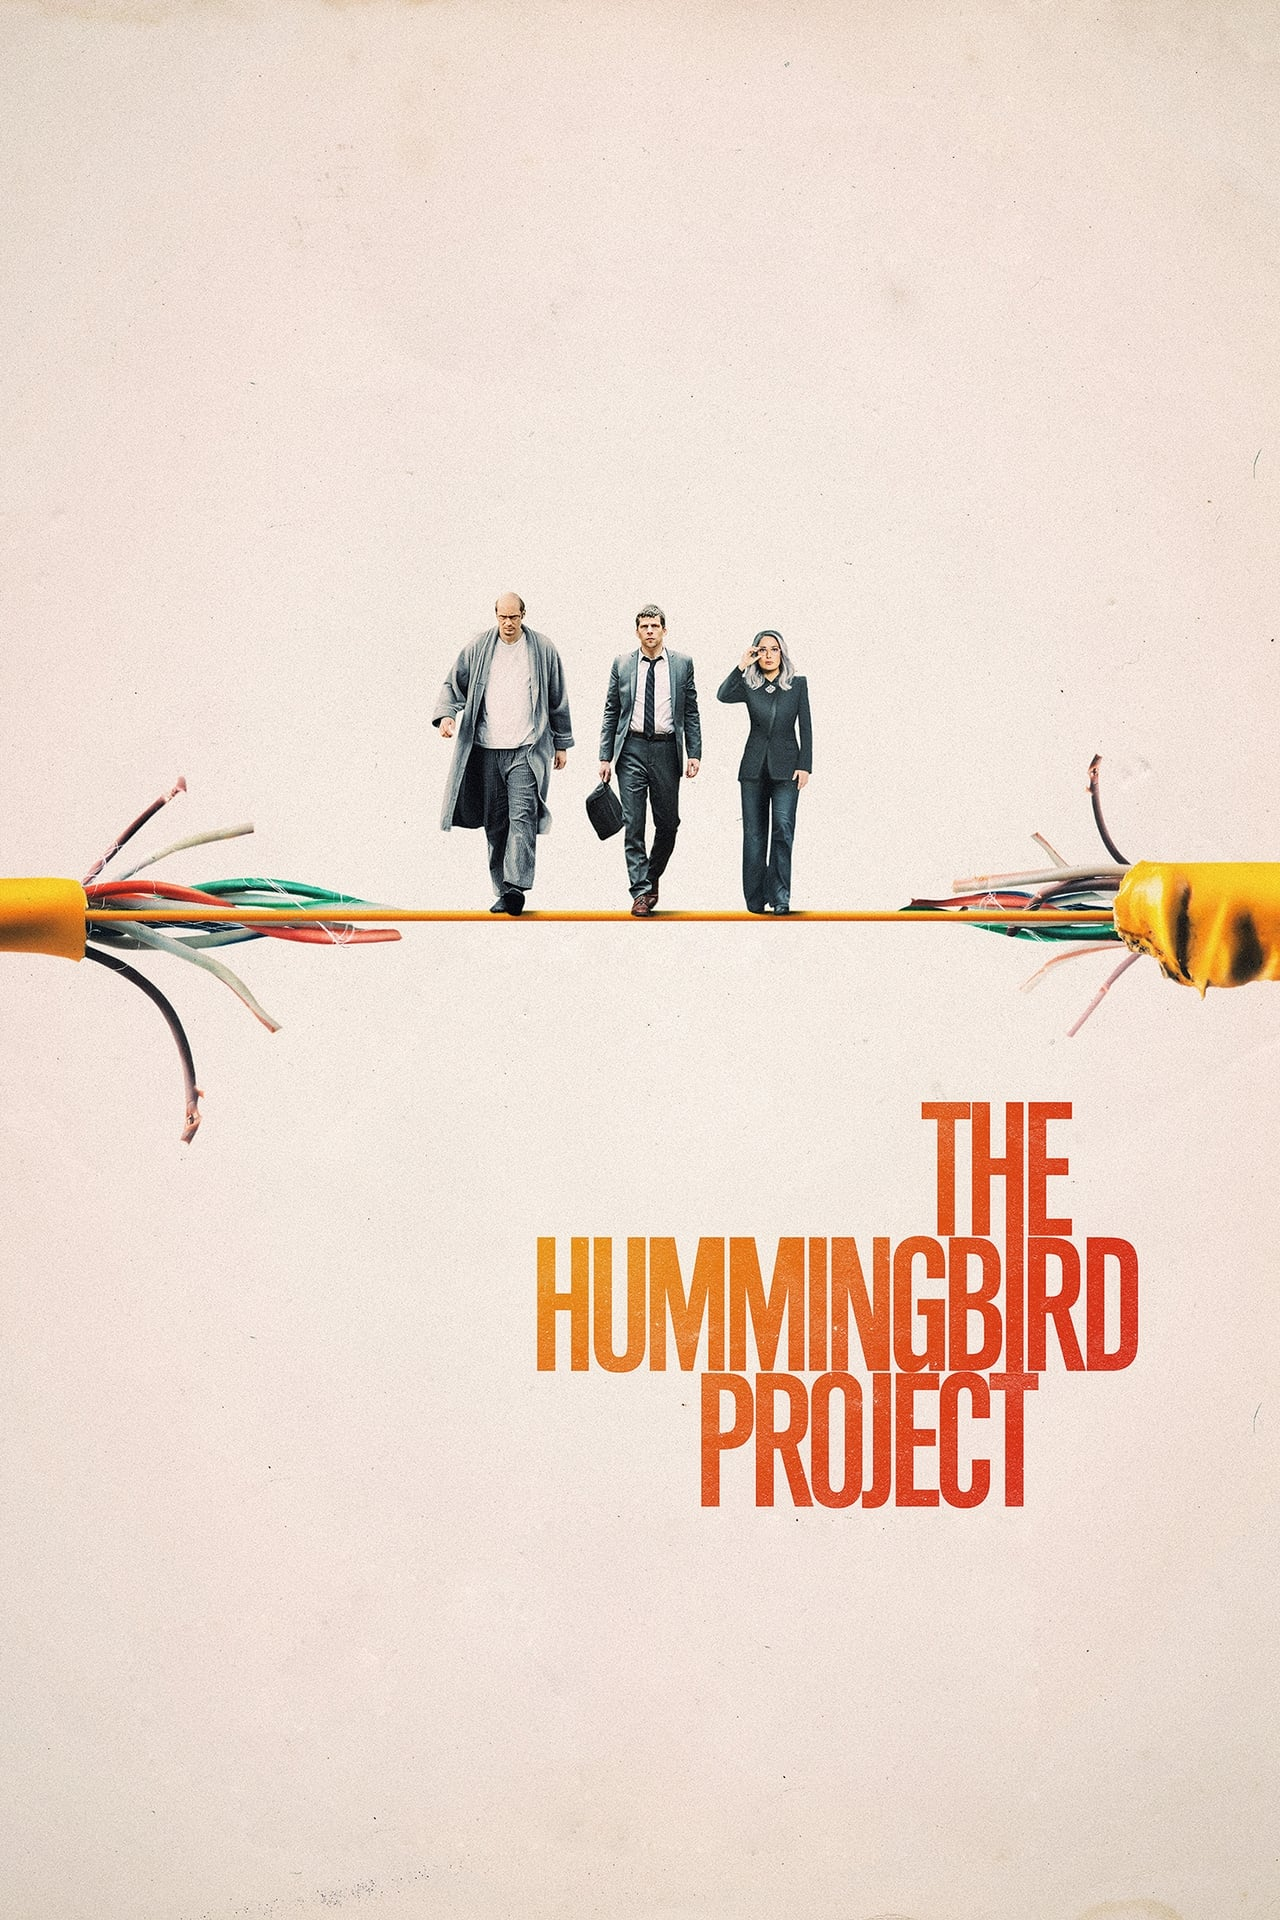 The Hummingbird Project image